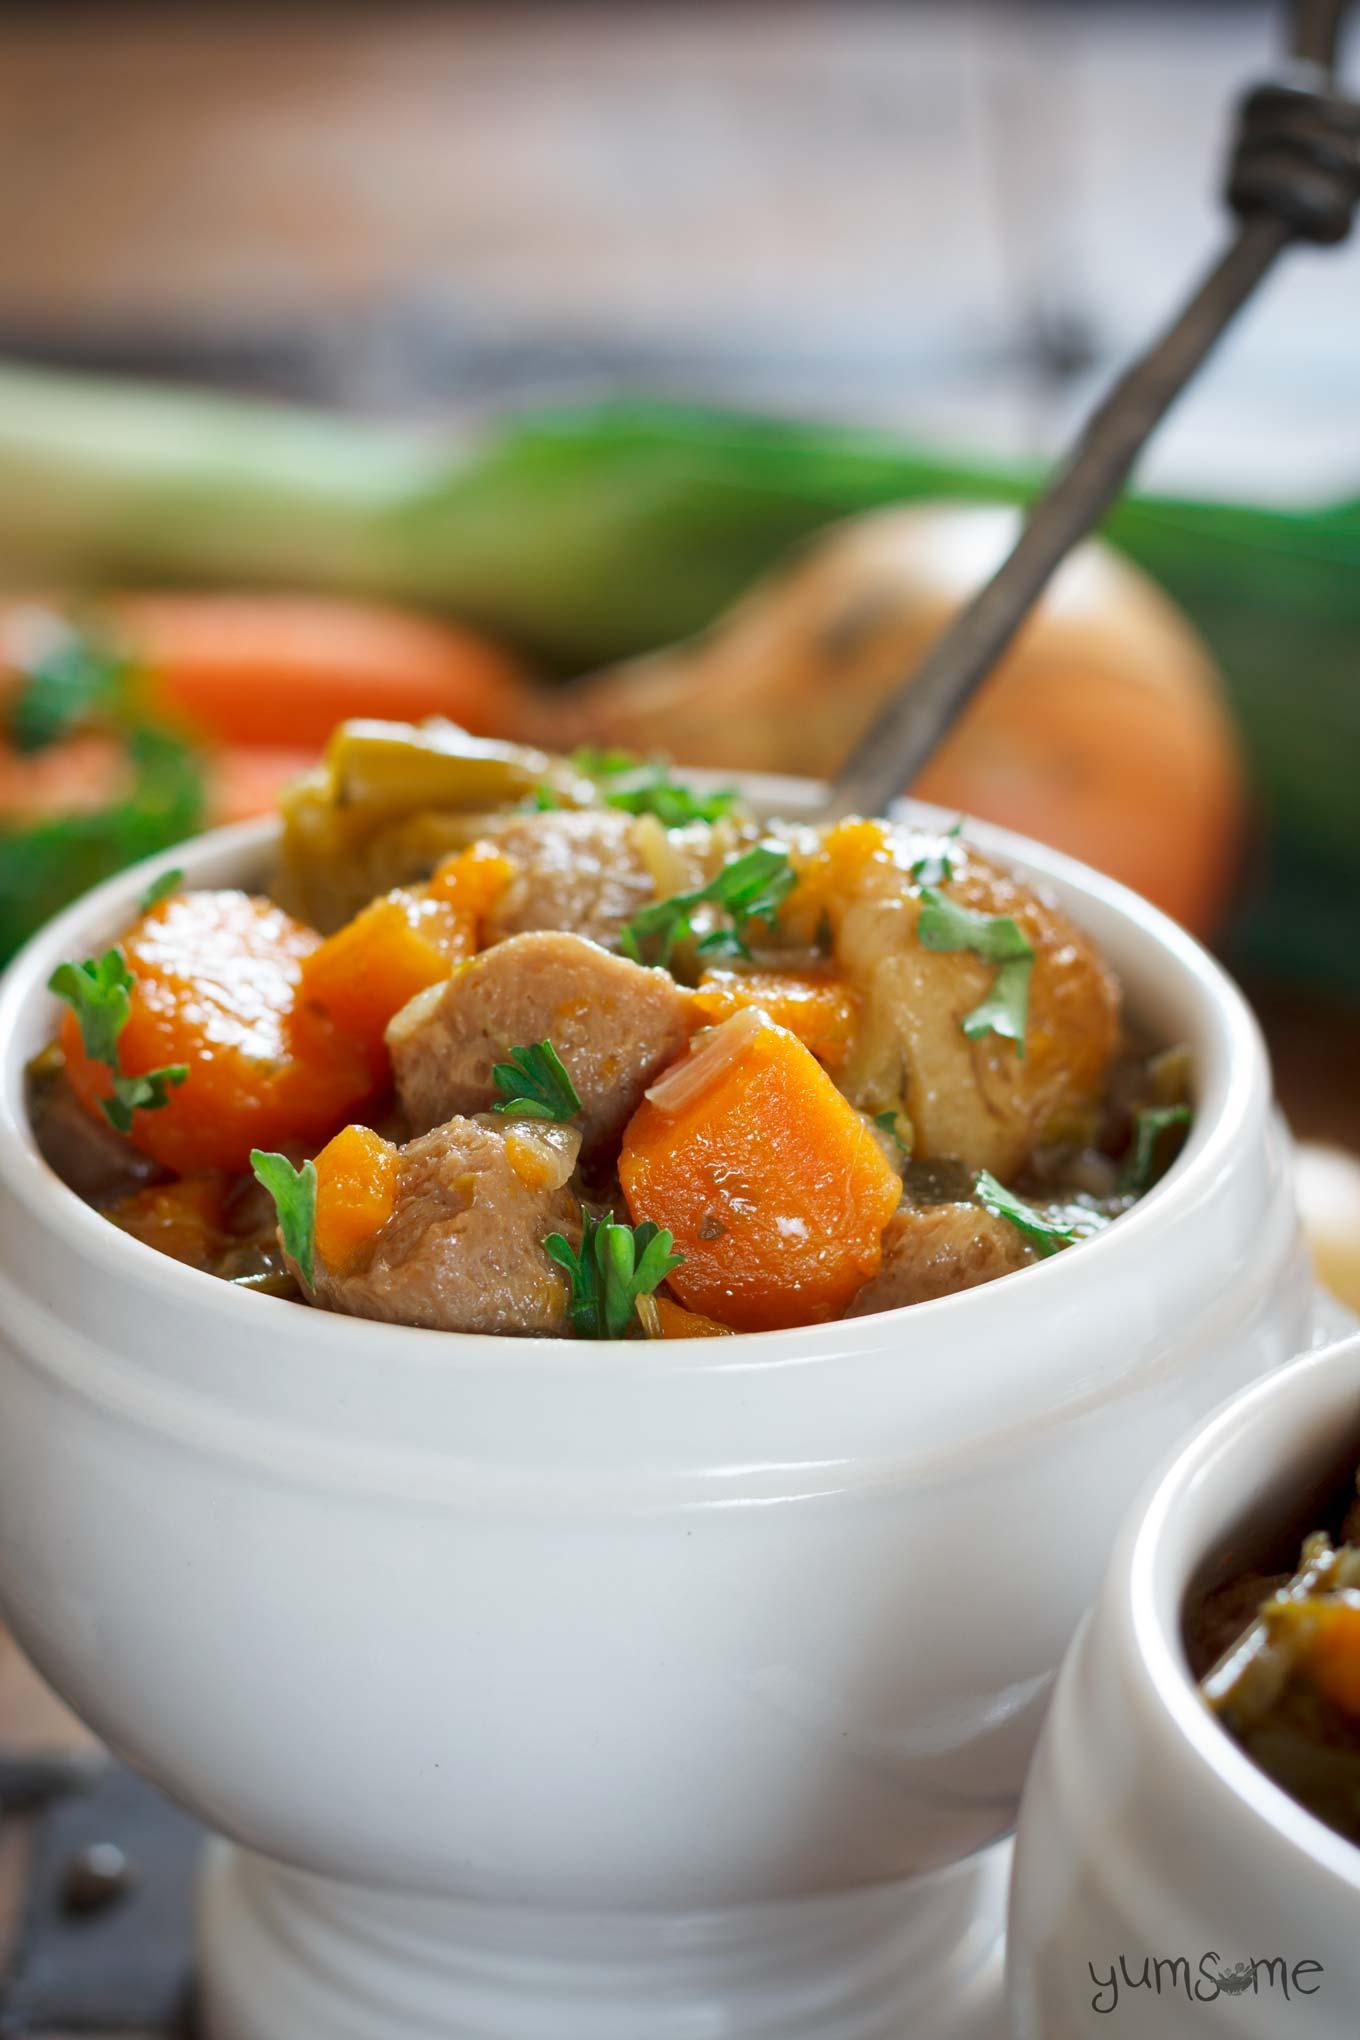 A white bowl containing vegan Irish stew.